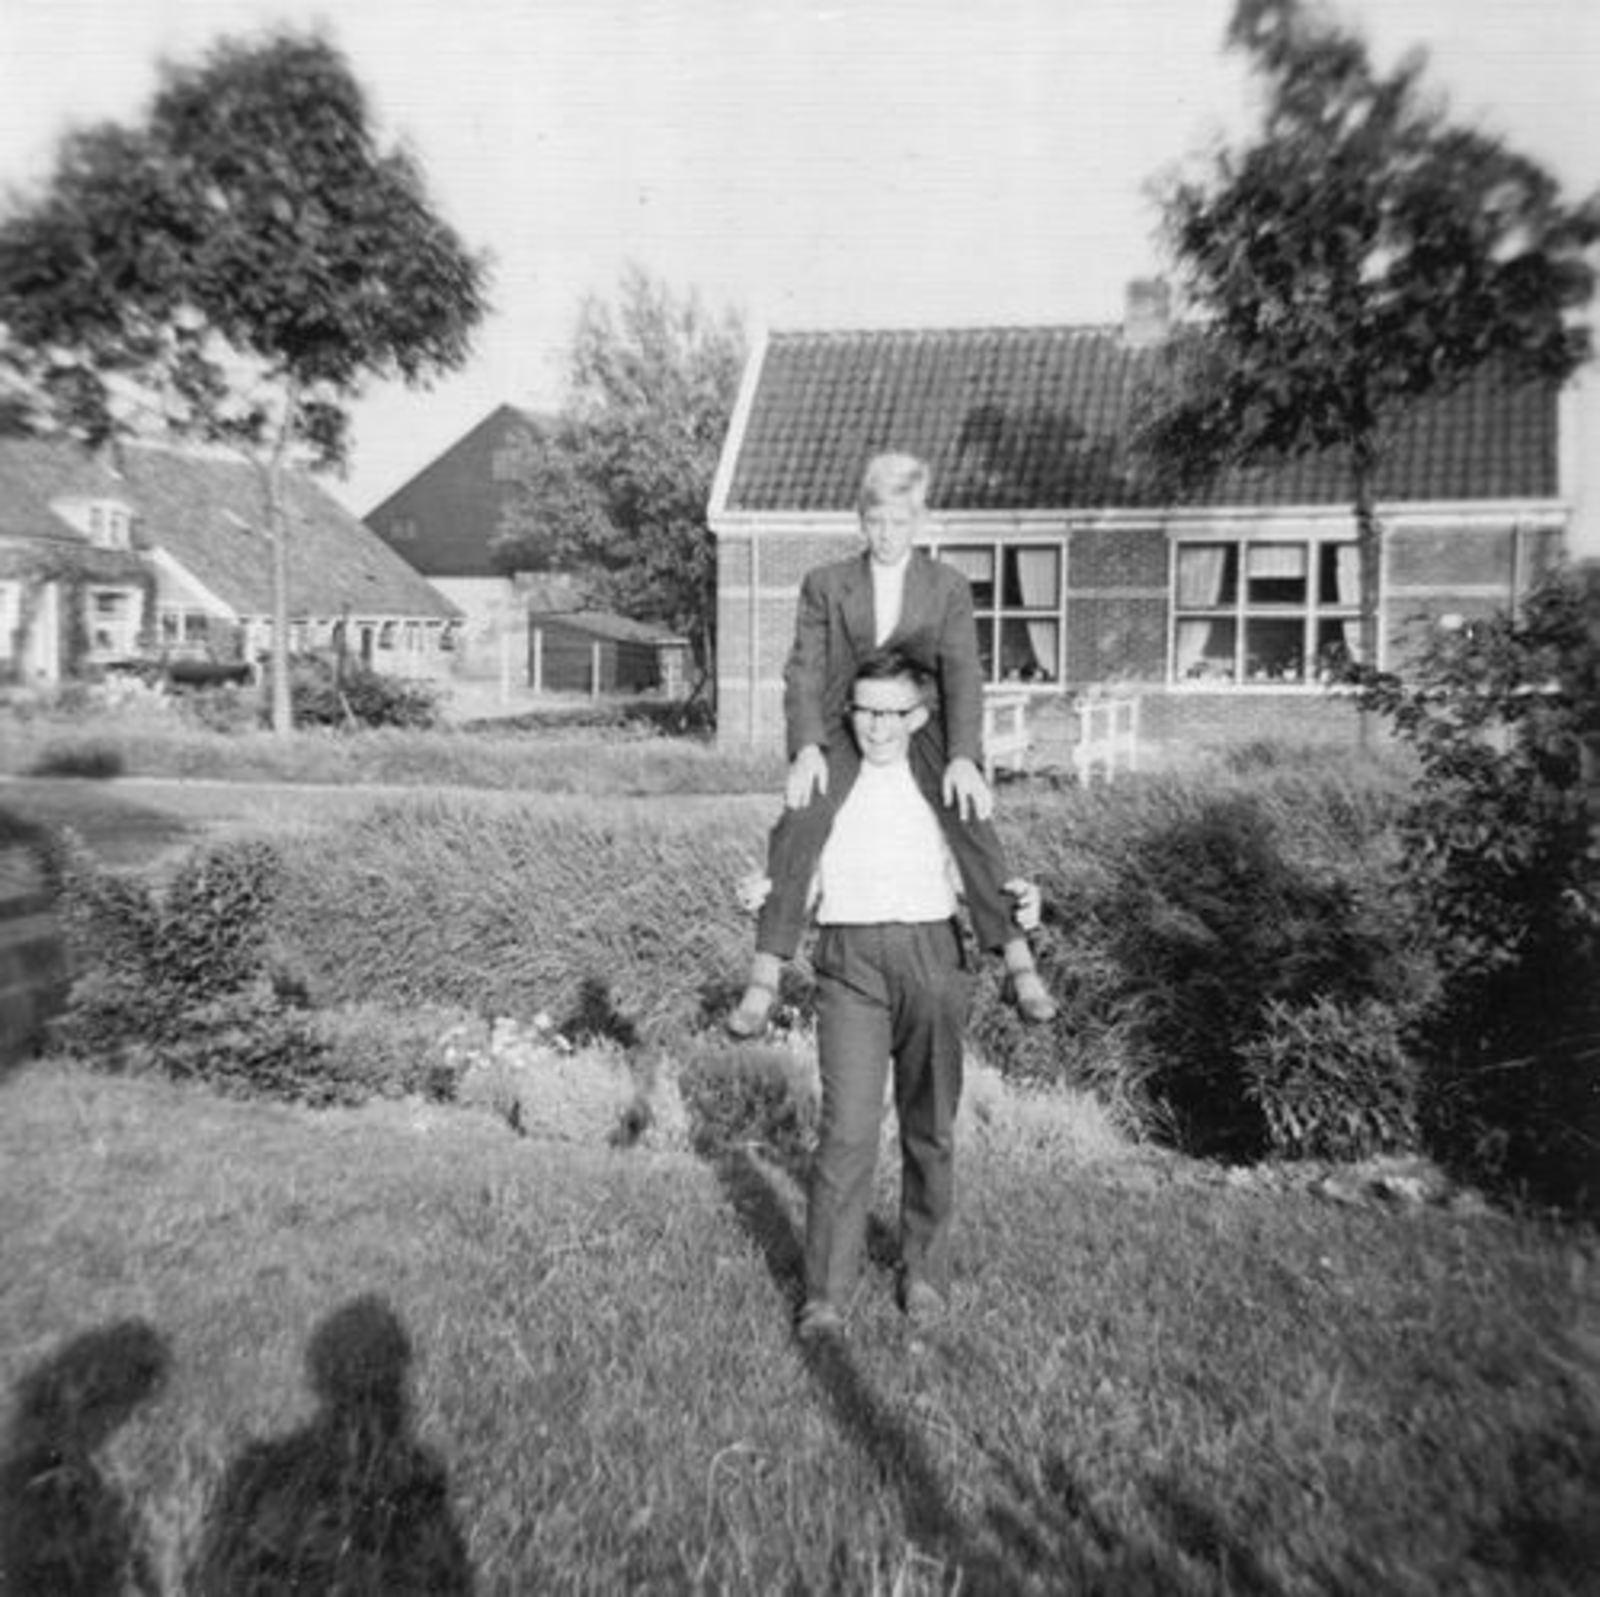 Rijnlanderweg O 0822-824 196_ Huize Groeneweg